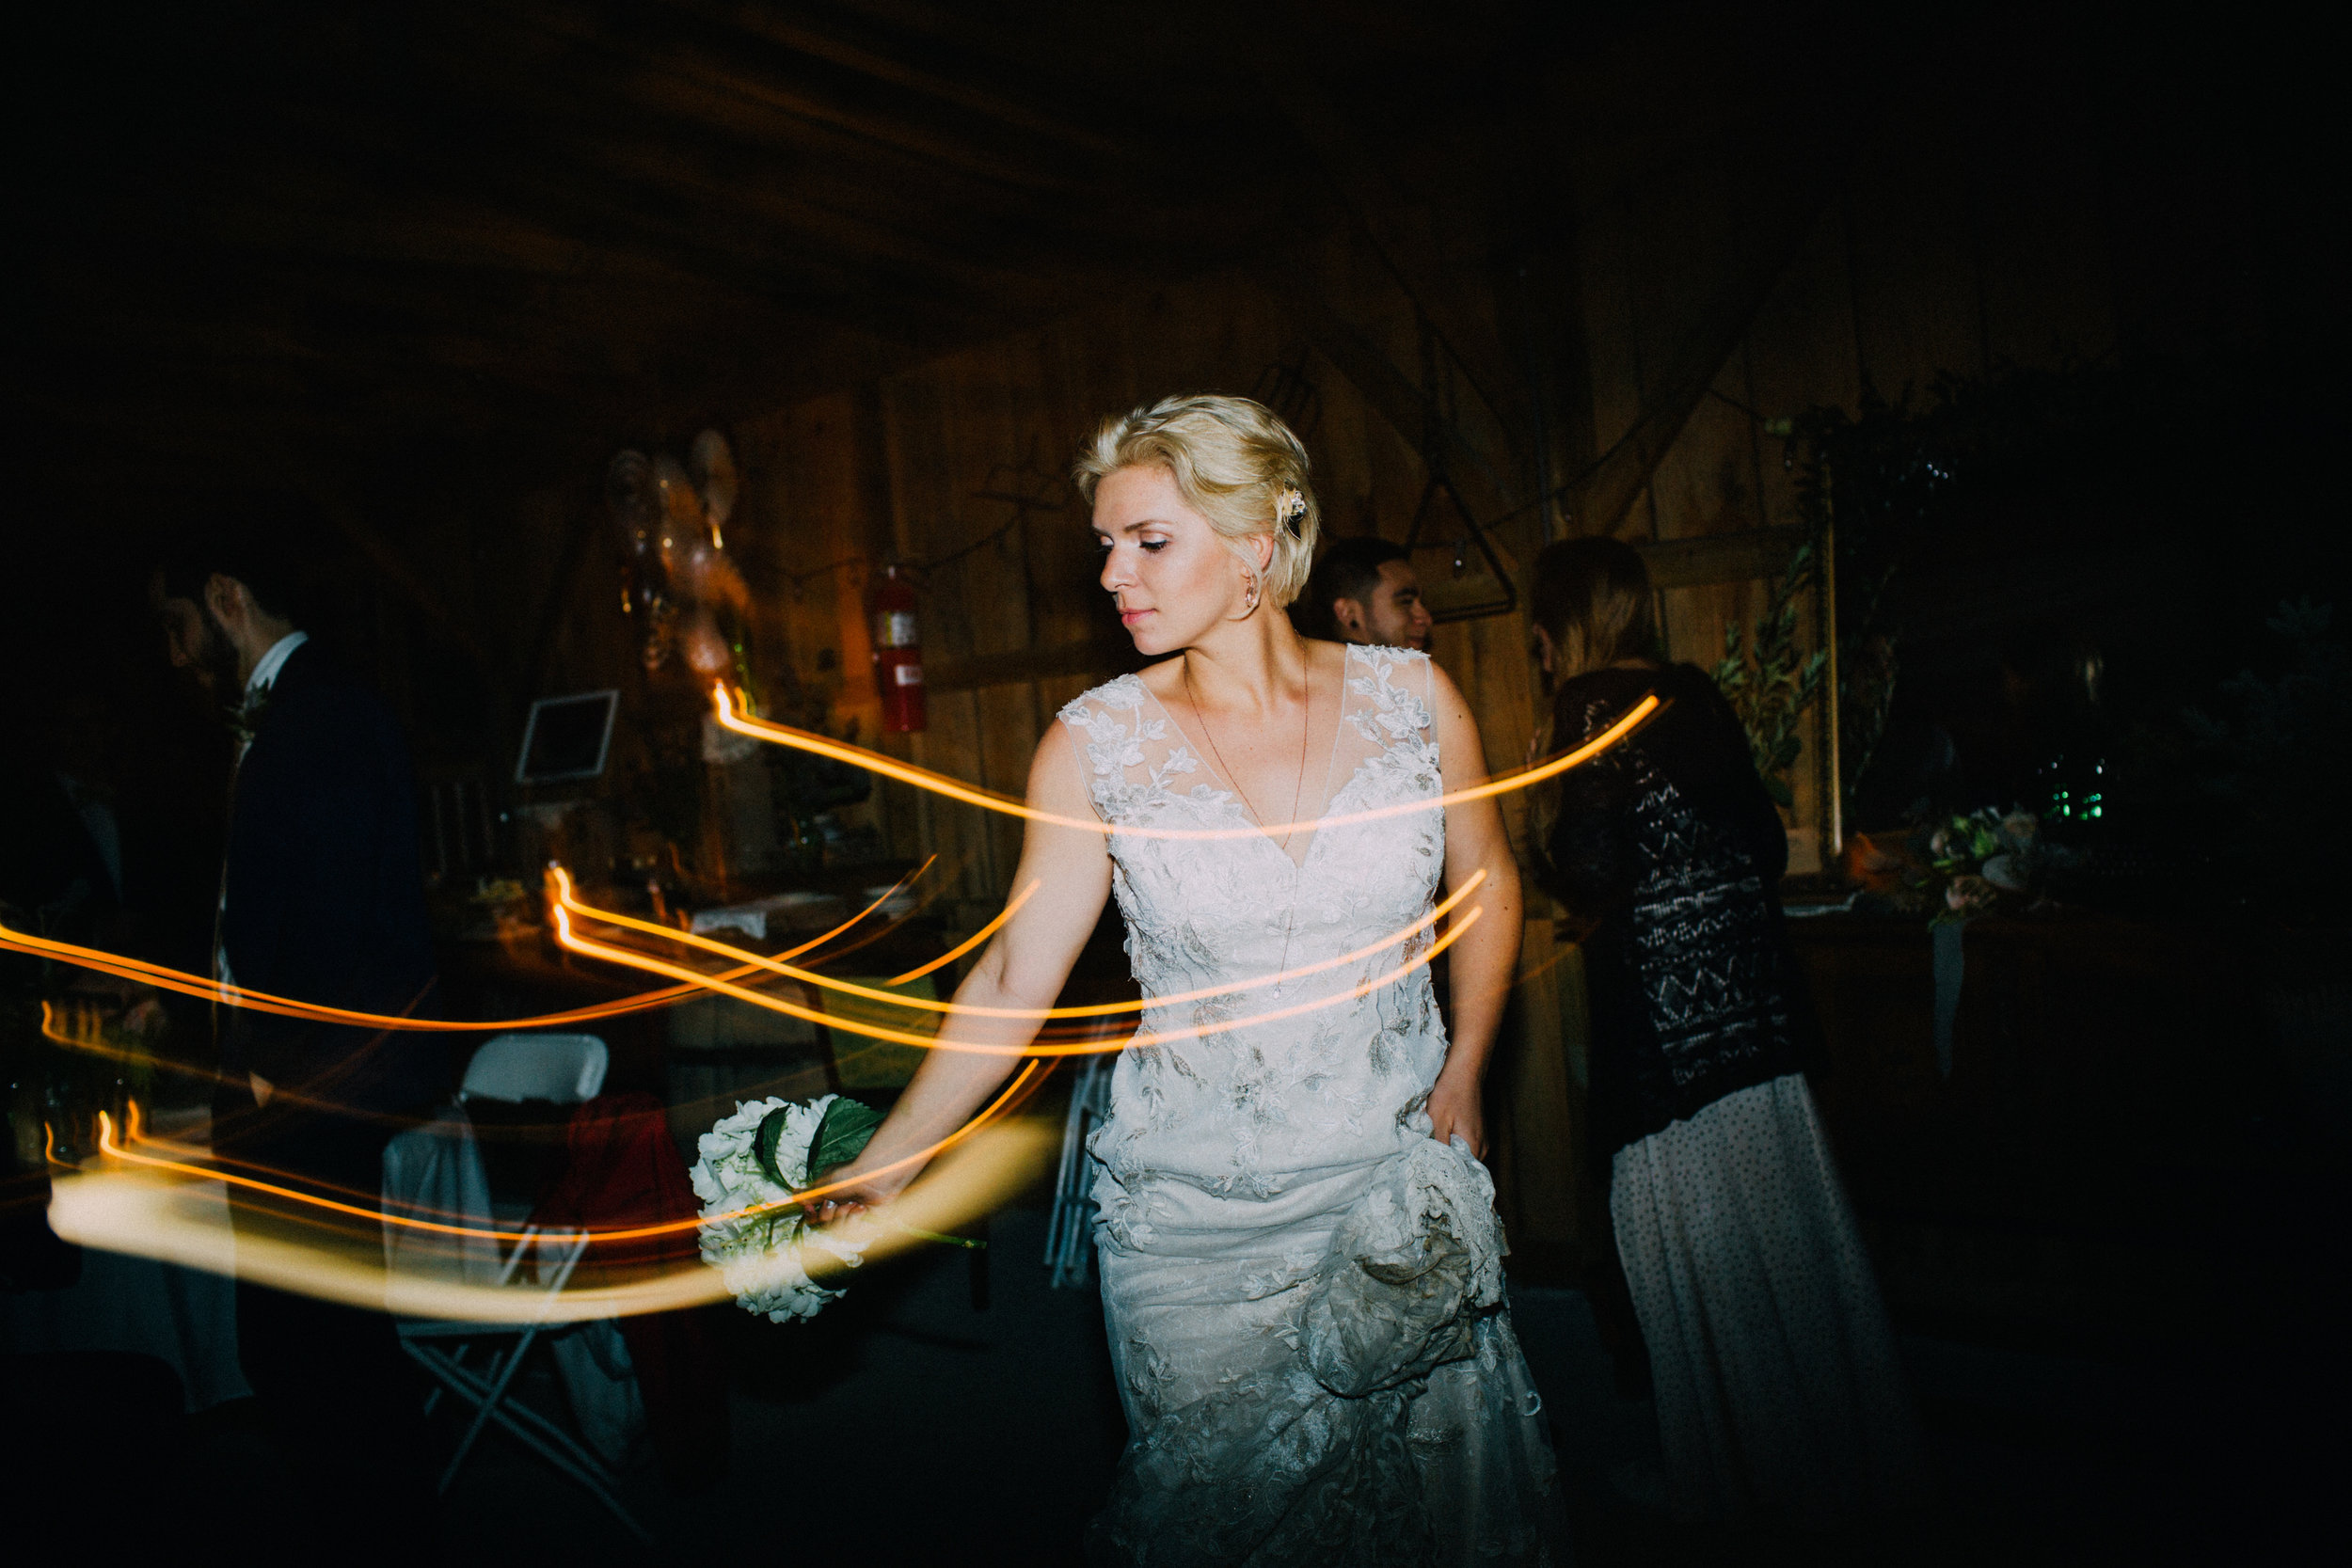 dancing bride bouquet toss at reception